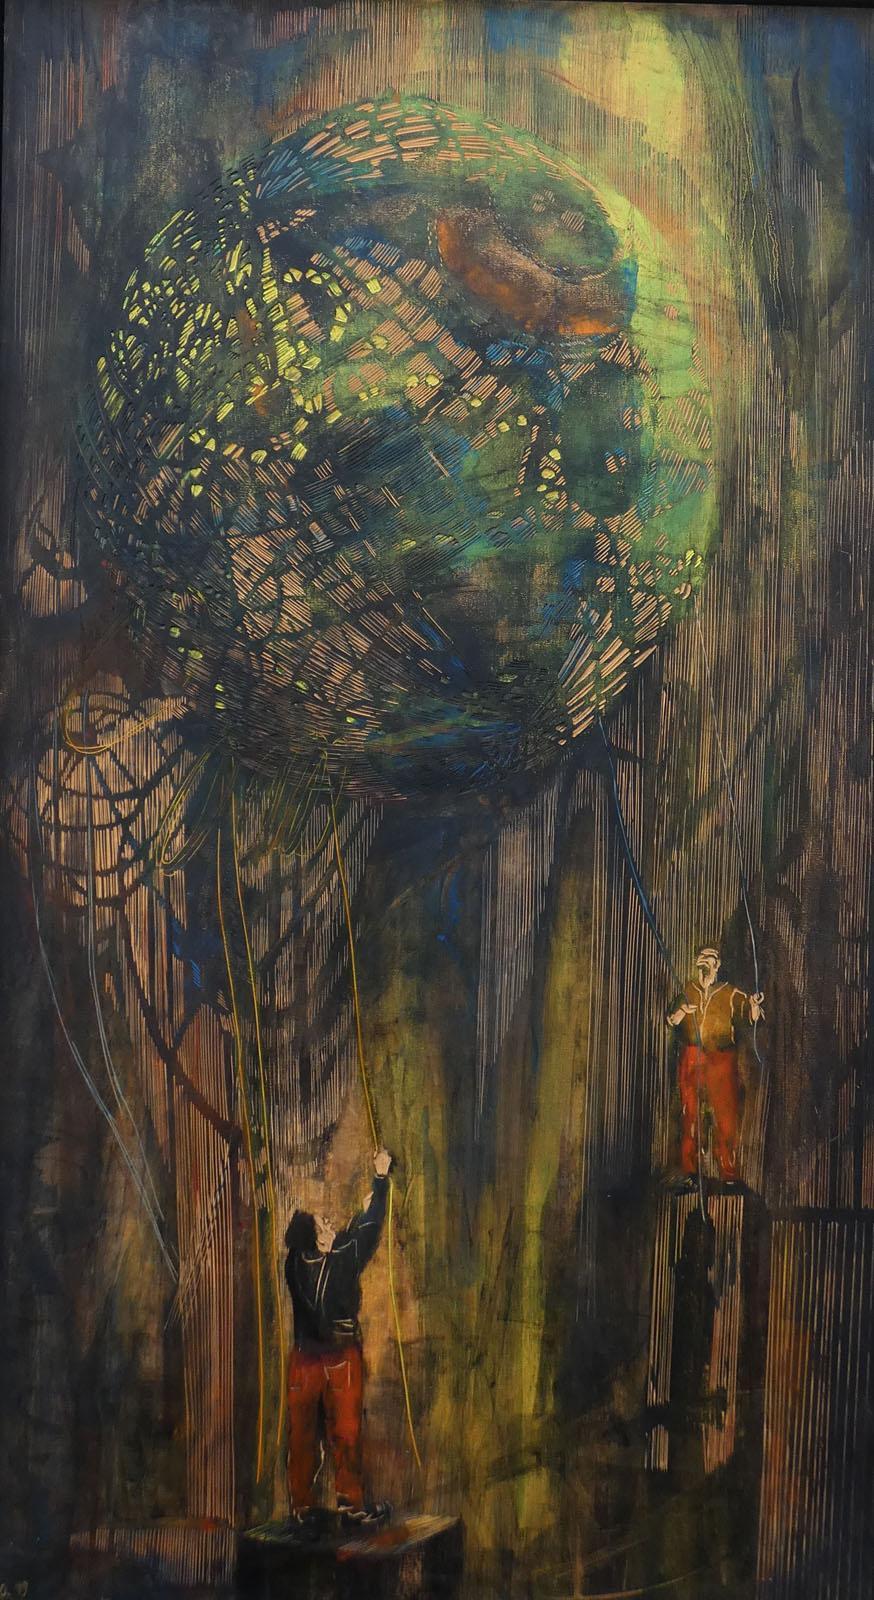 Nachtkugel II, 2019, 116 x 66 cm, Linoleum, Alkydfarbe